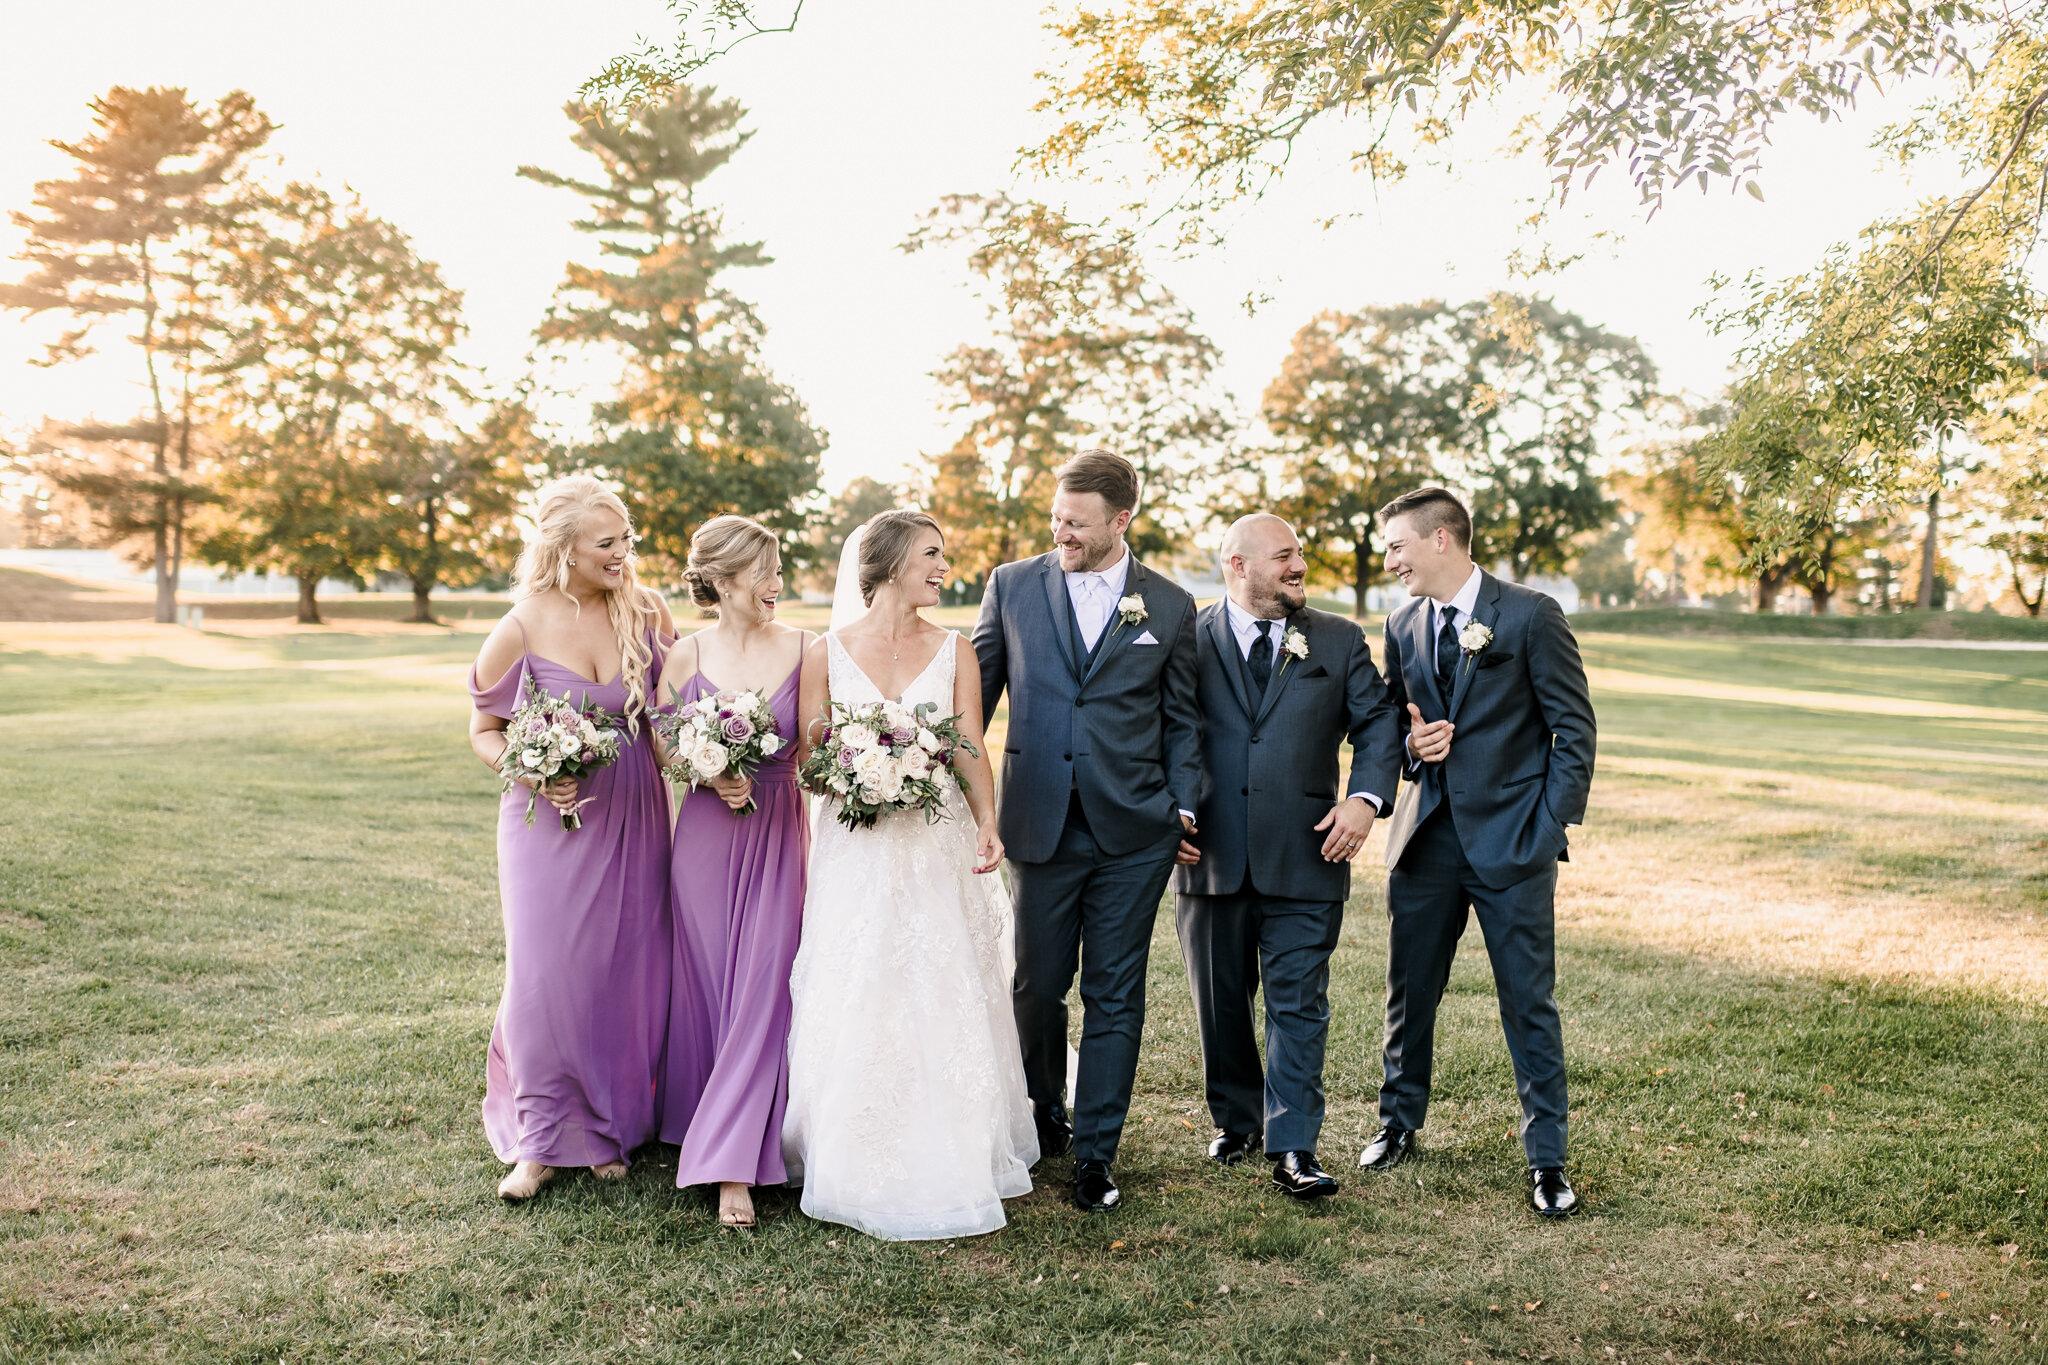 Coyle-Forsgate-Country-Club-Wedding-Photographer-16.JPG